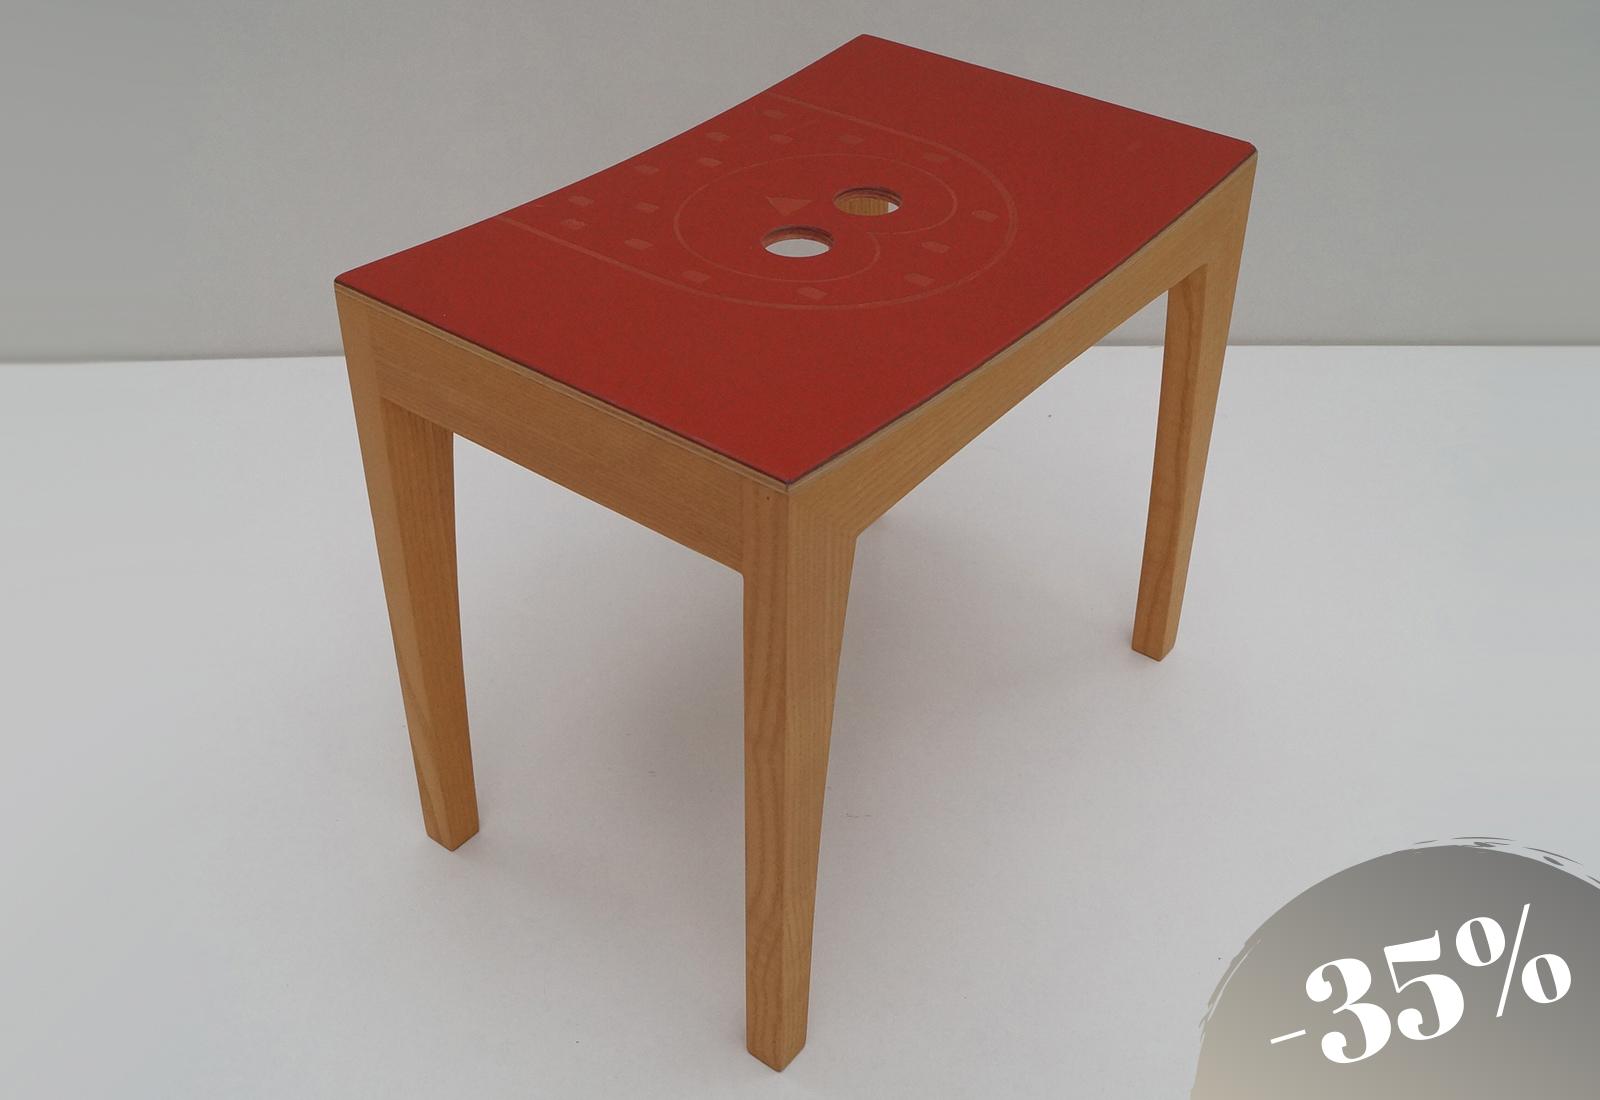 OTTO1 stool lino